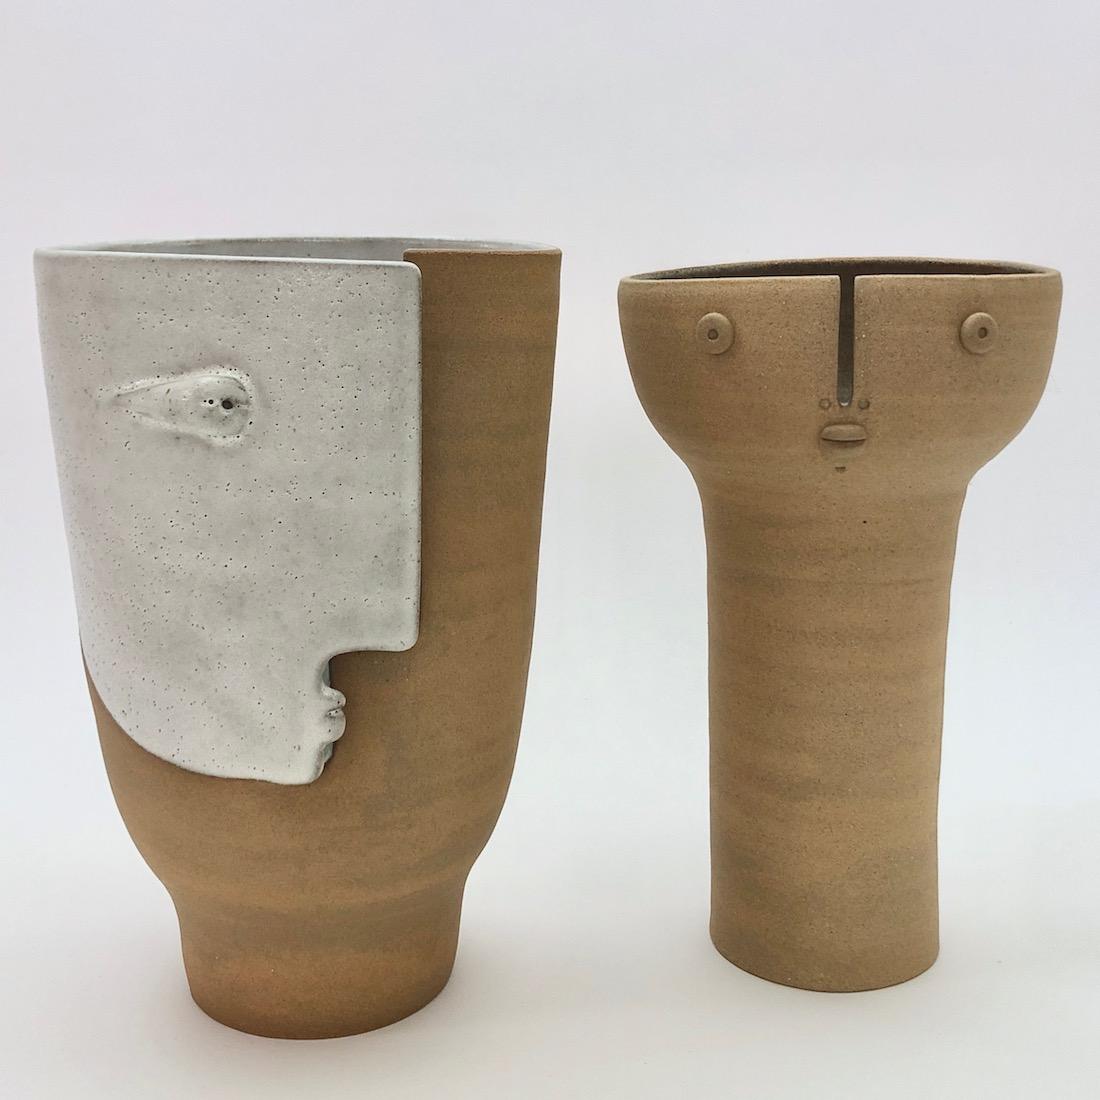 DaLo - Vase cornet